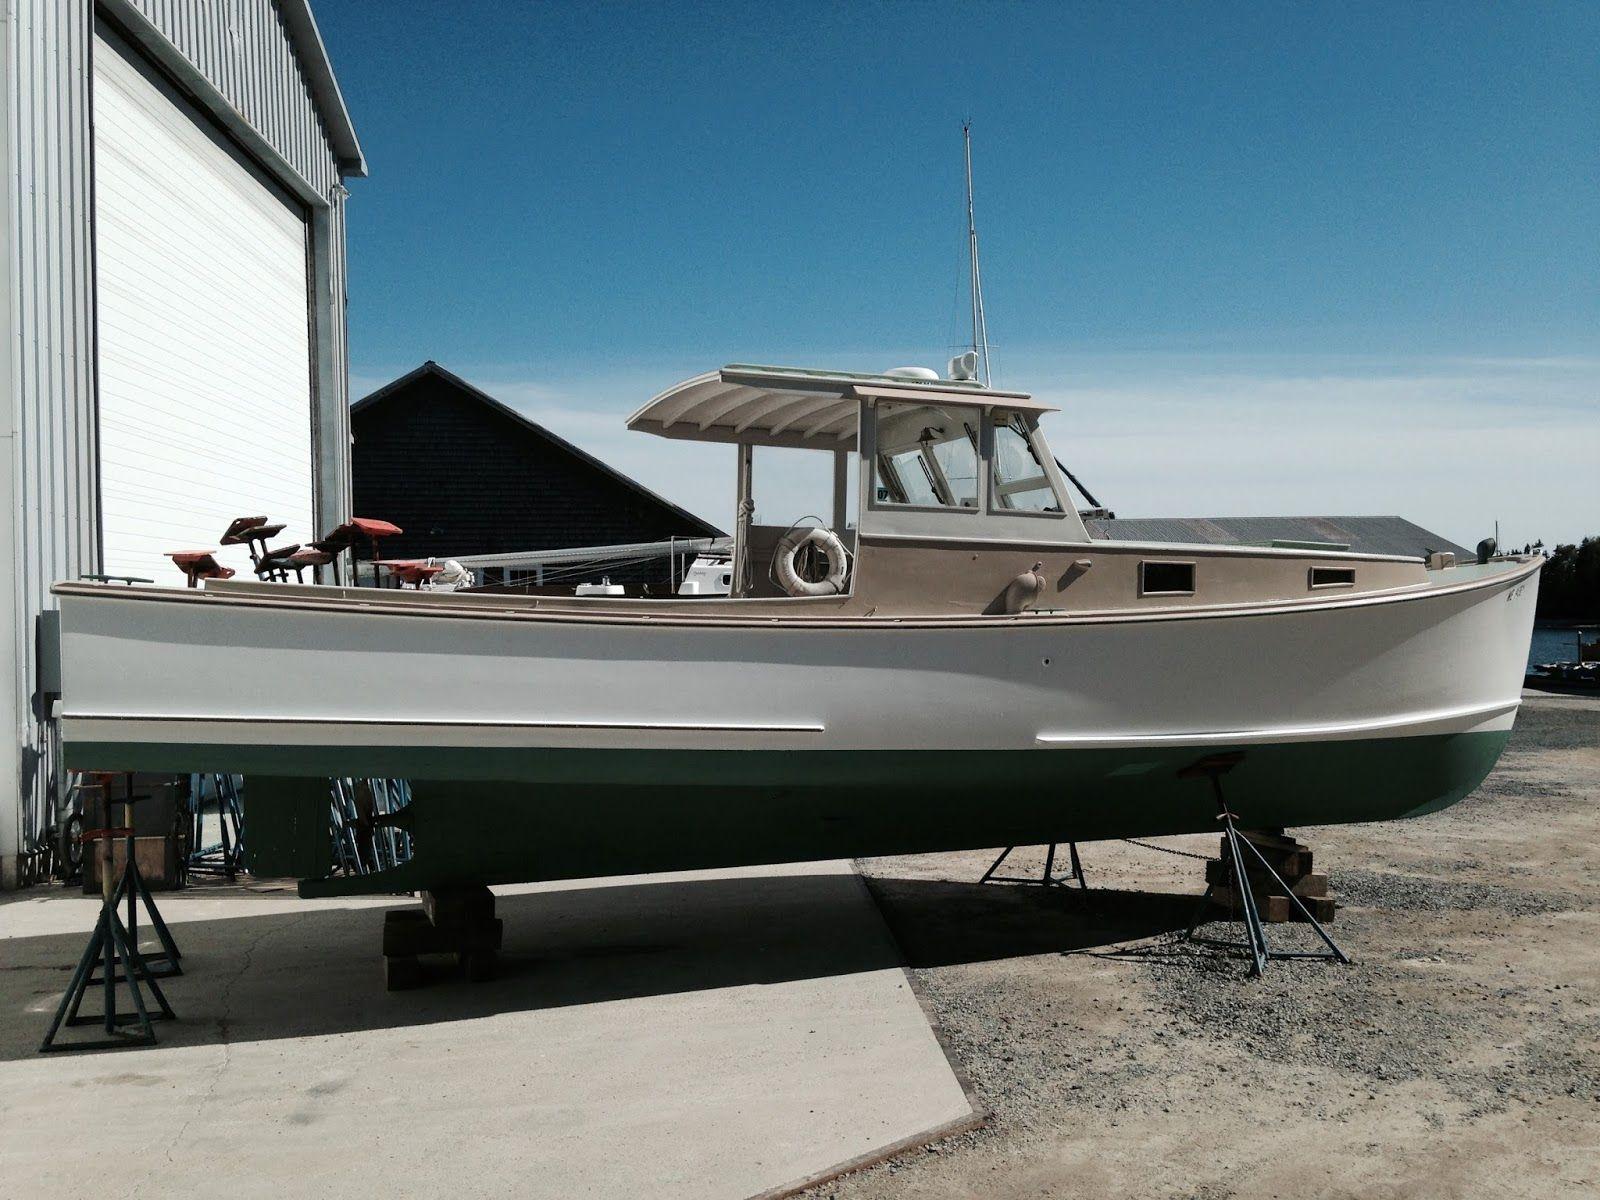 Boats yachts maine boats lobster boats picnic boats sailing - Autoliterate October 2015 Boatsoctober